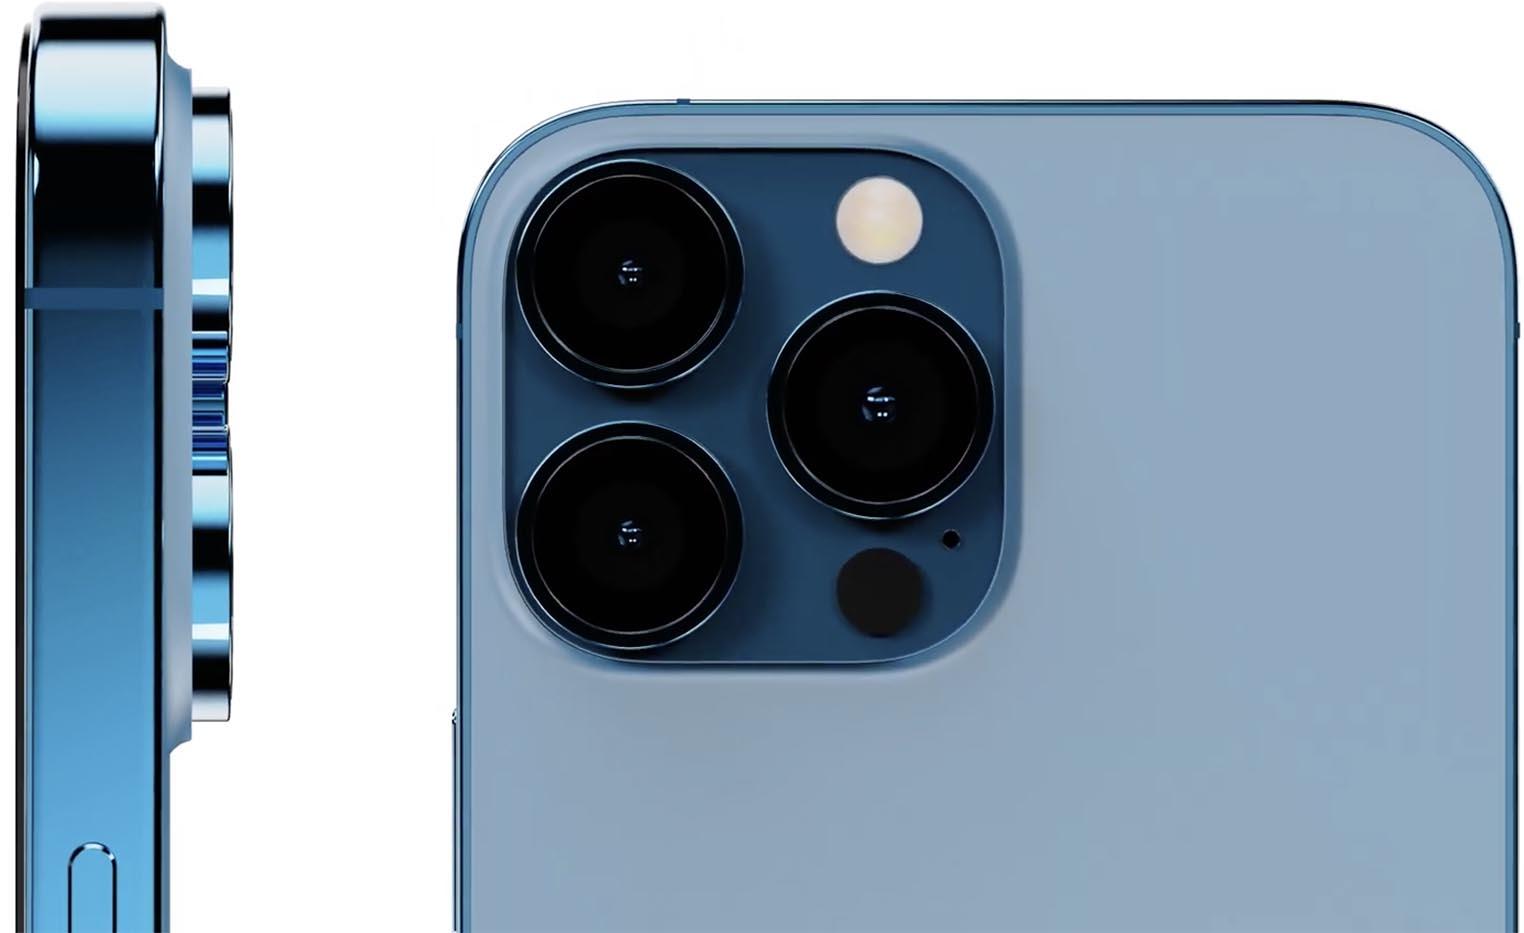 Rendus appareils photos iPhone 13 Pro